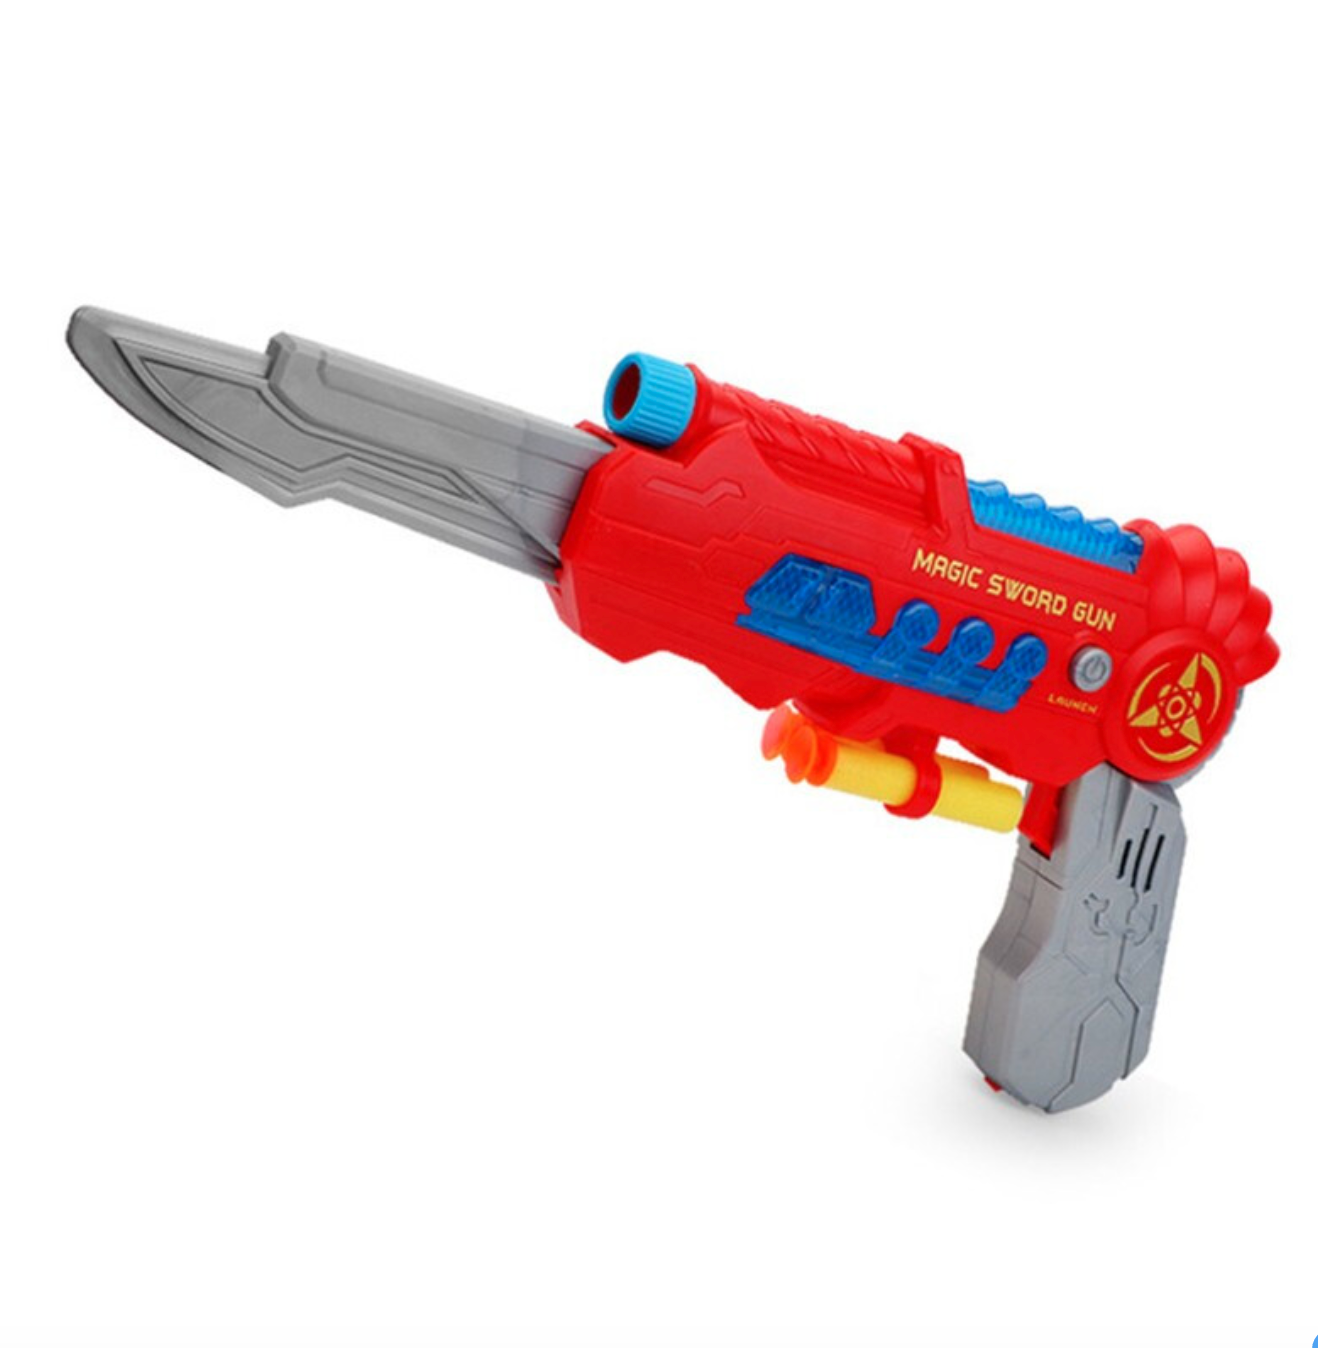 Inbay 茵蓓 儿童玩具枪变形刀声光软弹枪